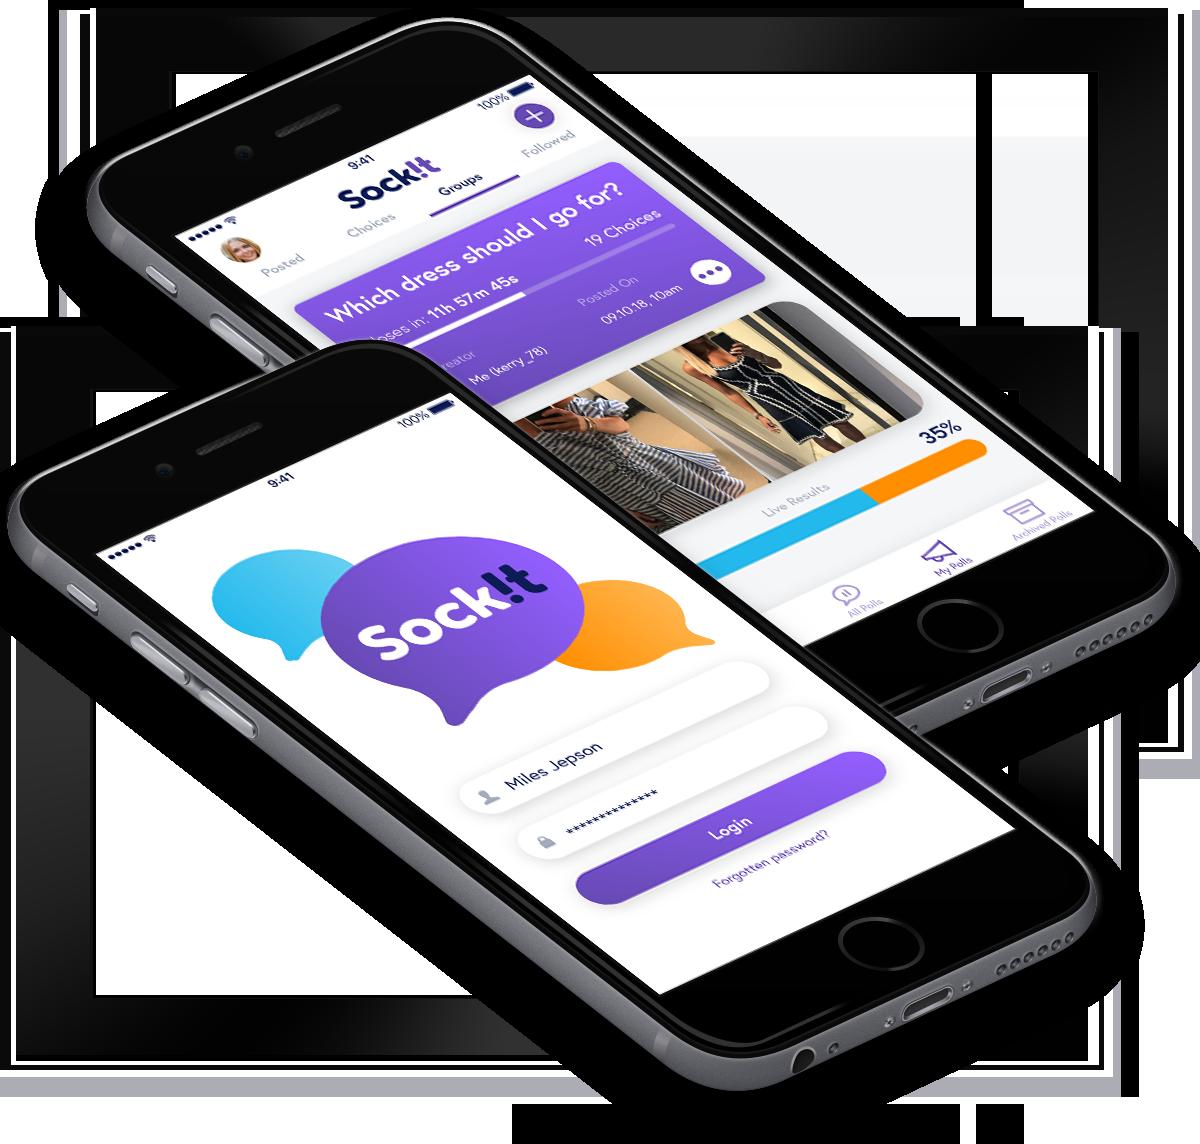 Sock!t web app design and development